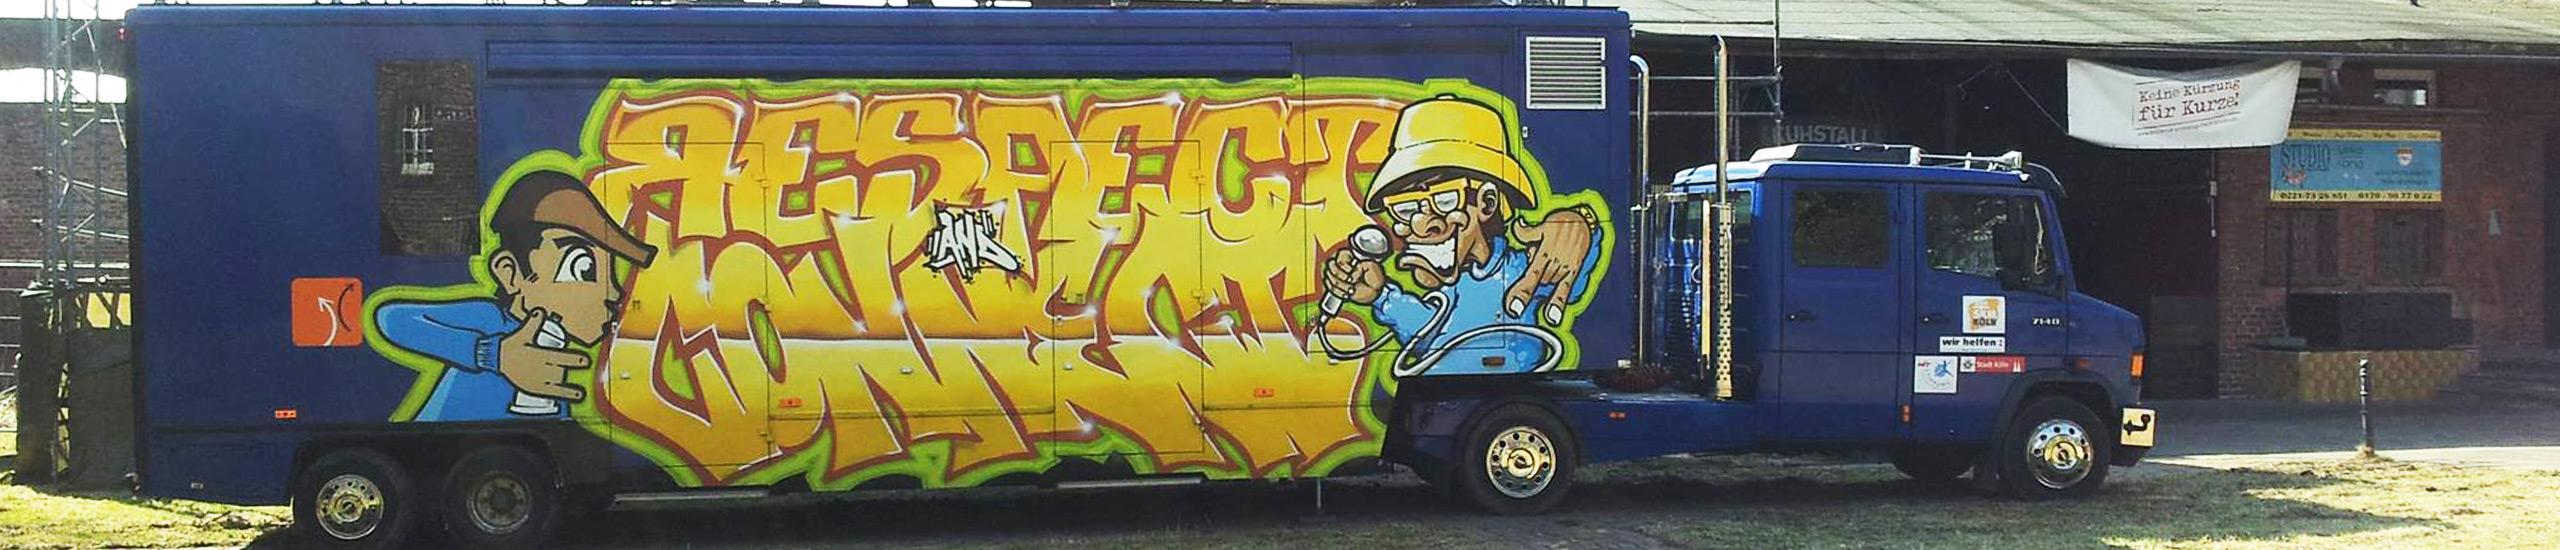 Jugendkulturprojekt Treff im Truck